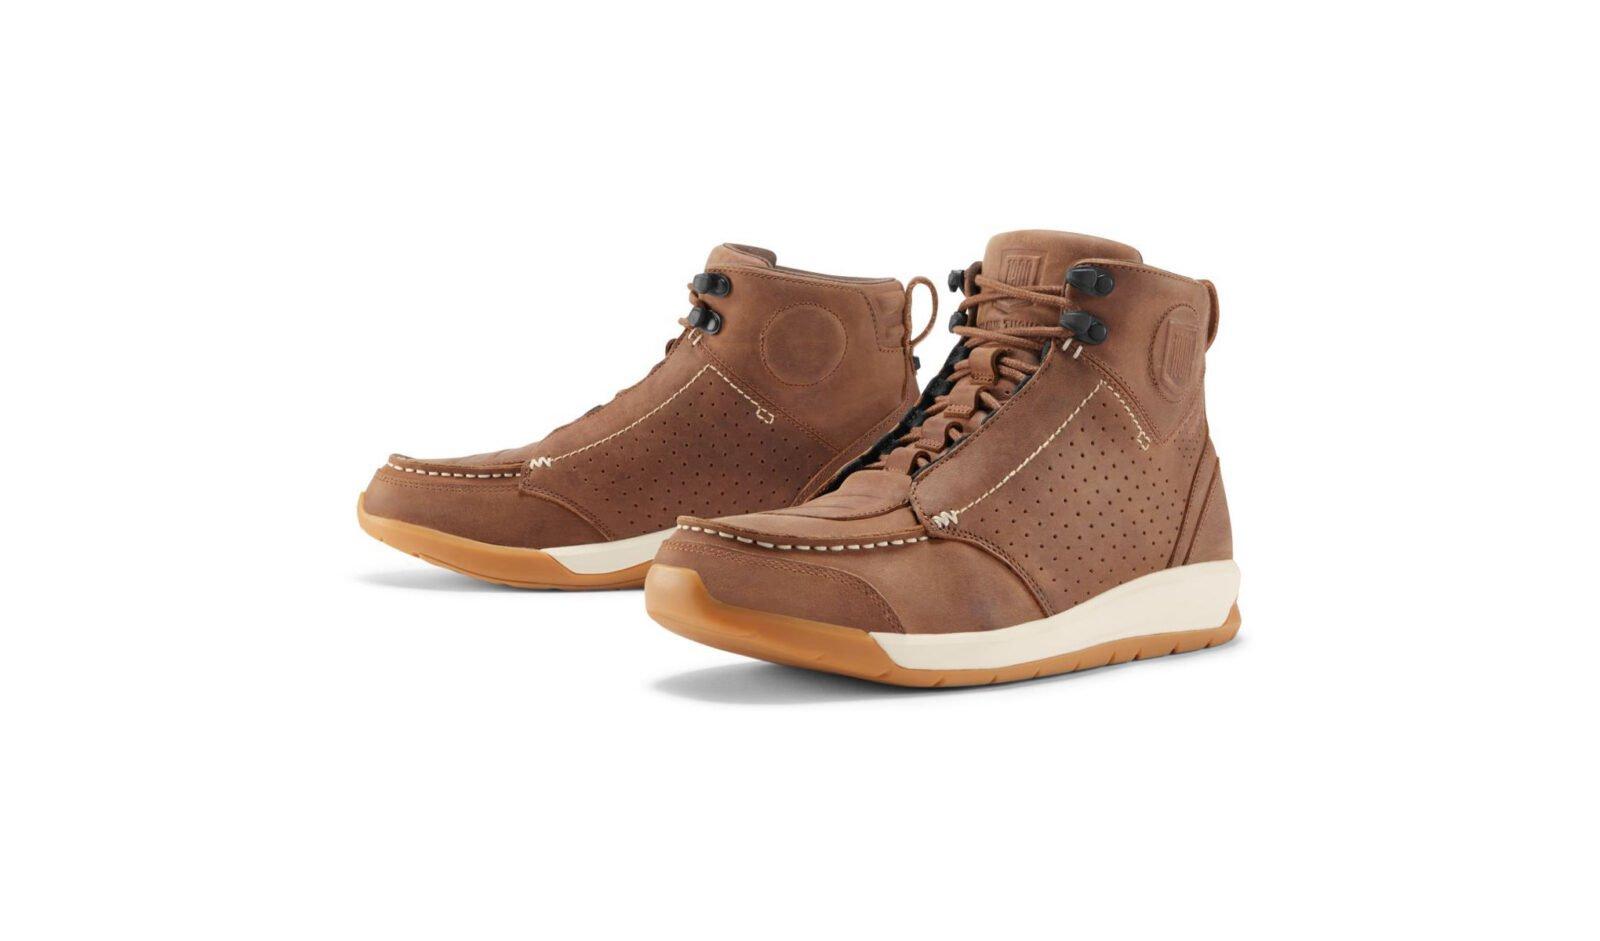 Icon 1000 Truant 2 Boots 1600x941 - Icon 1000 Truant 2 Boots